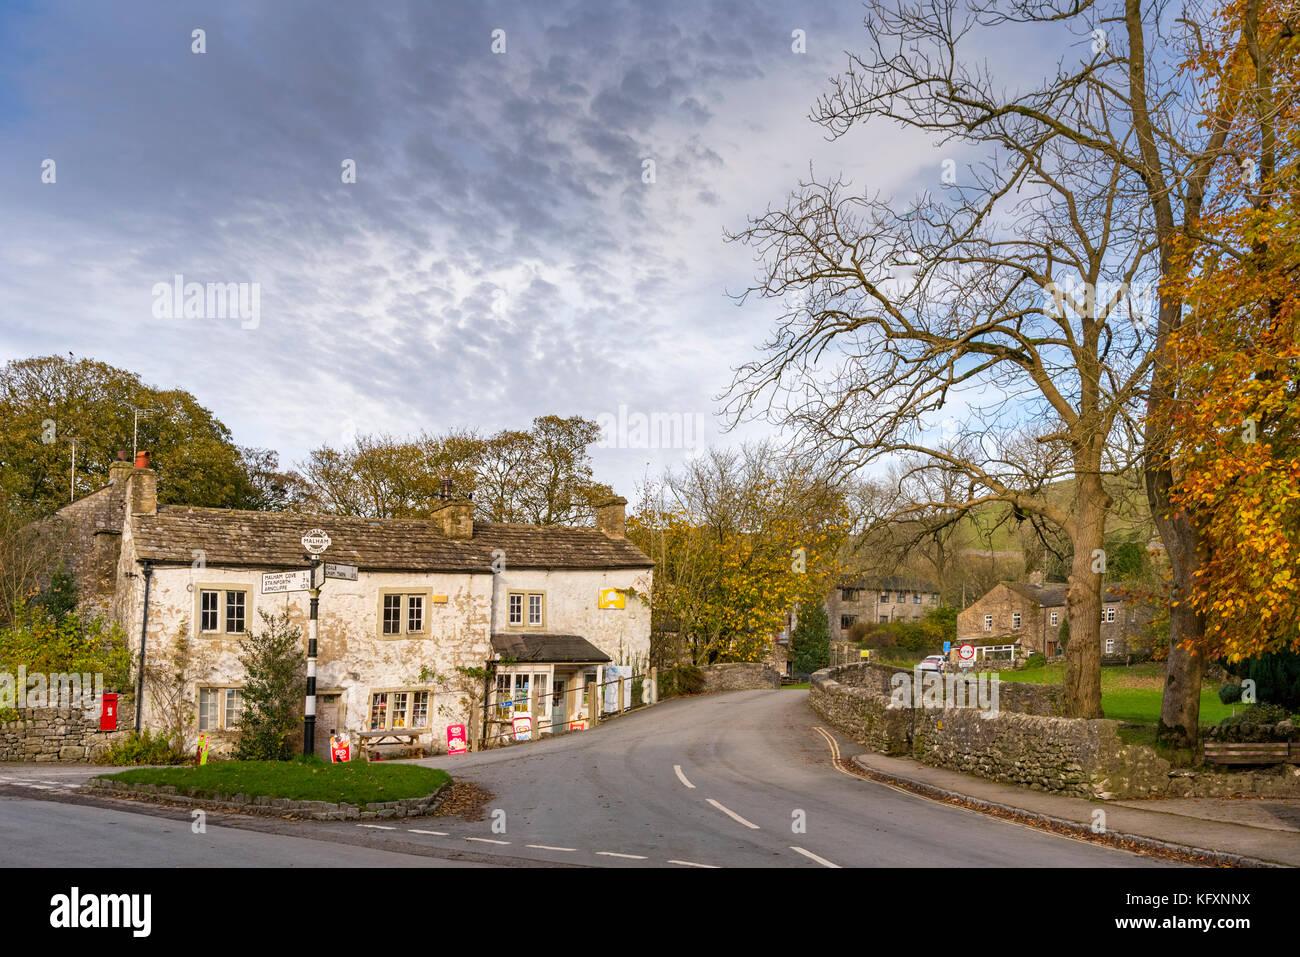 North Yorkshire. Malham district. - Stock Image